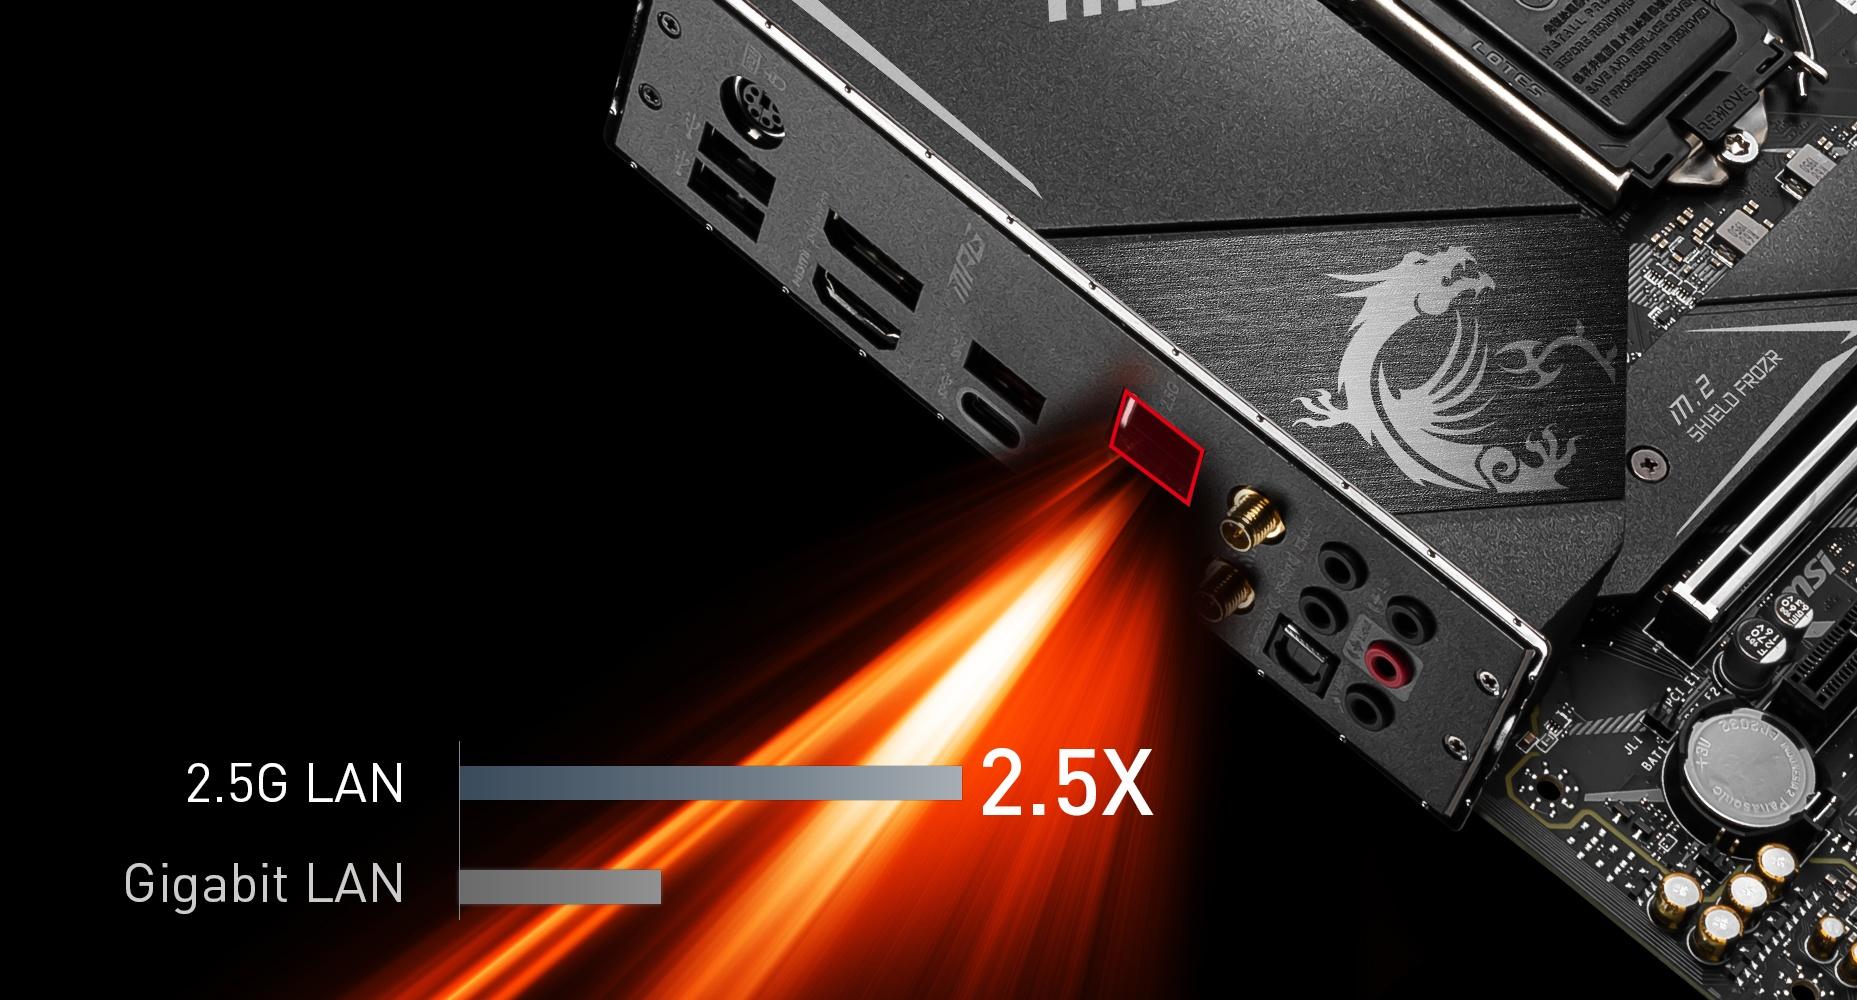 MSI MPG Z490M GAMING EDGE WIFI MAXIMIUM DATA TRANSFER WITH 2.5G LAN